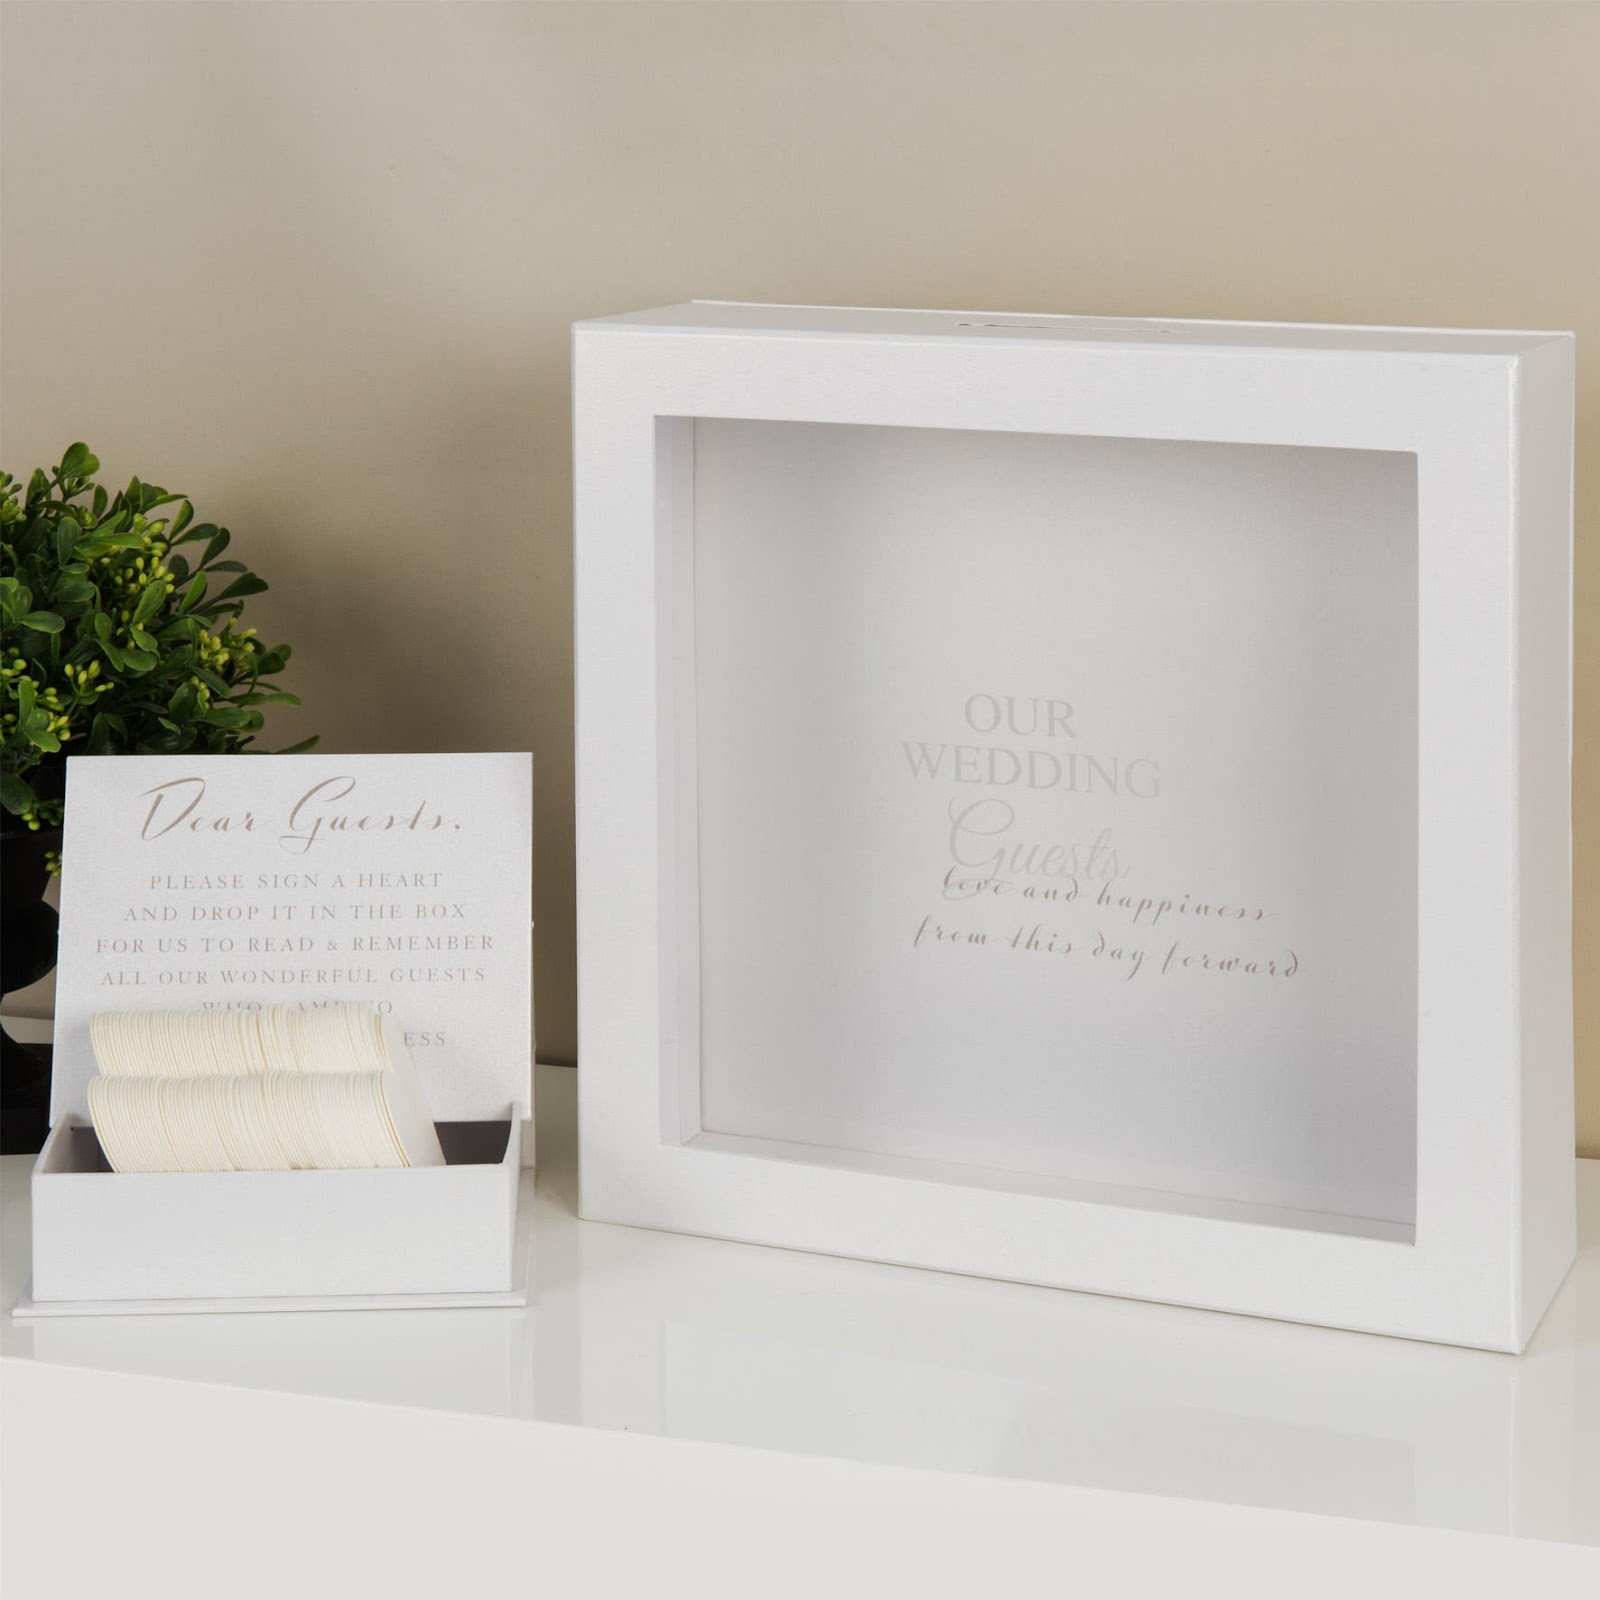 Unique wedding gift ideas; Clintons Heart Tokens Message Box